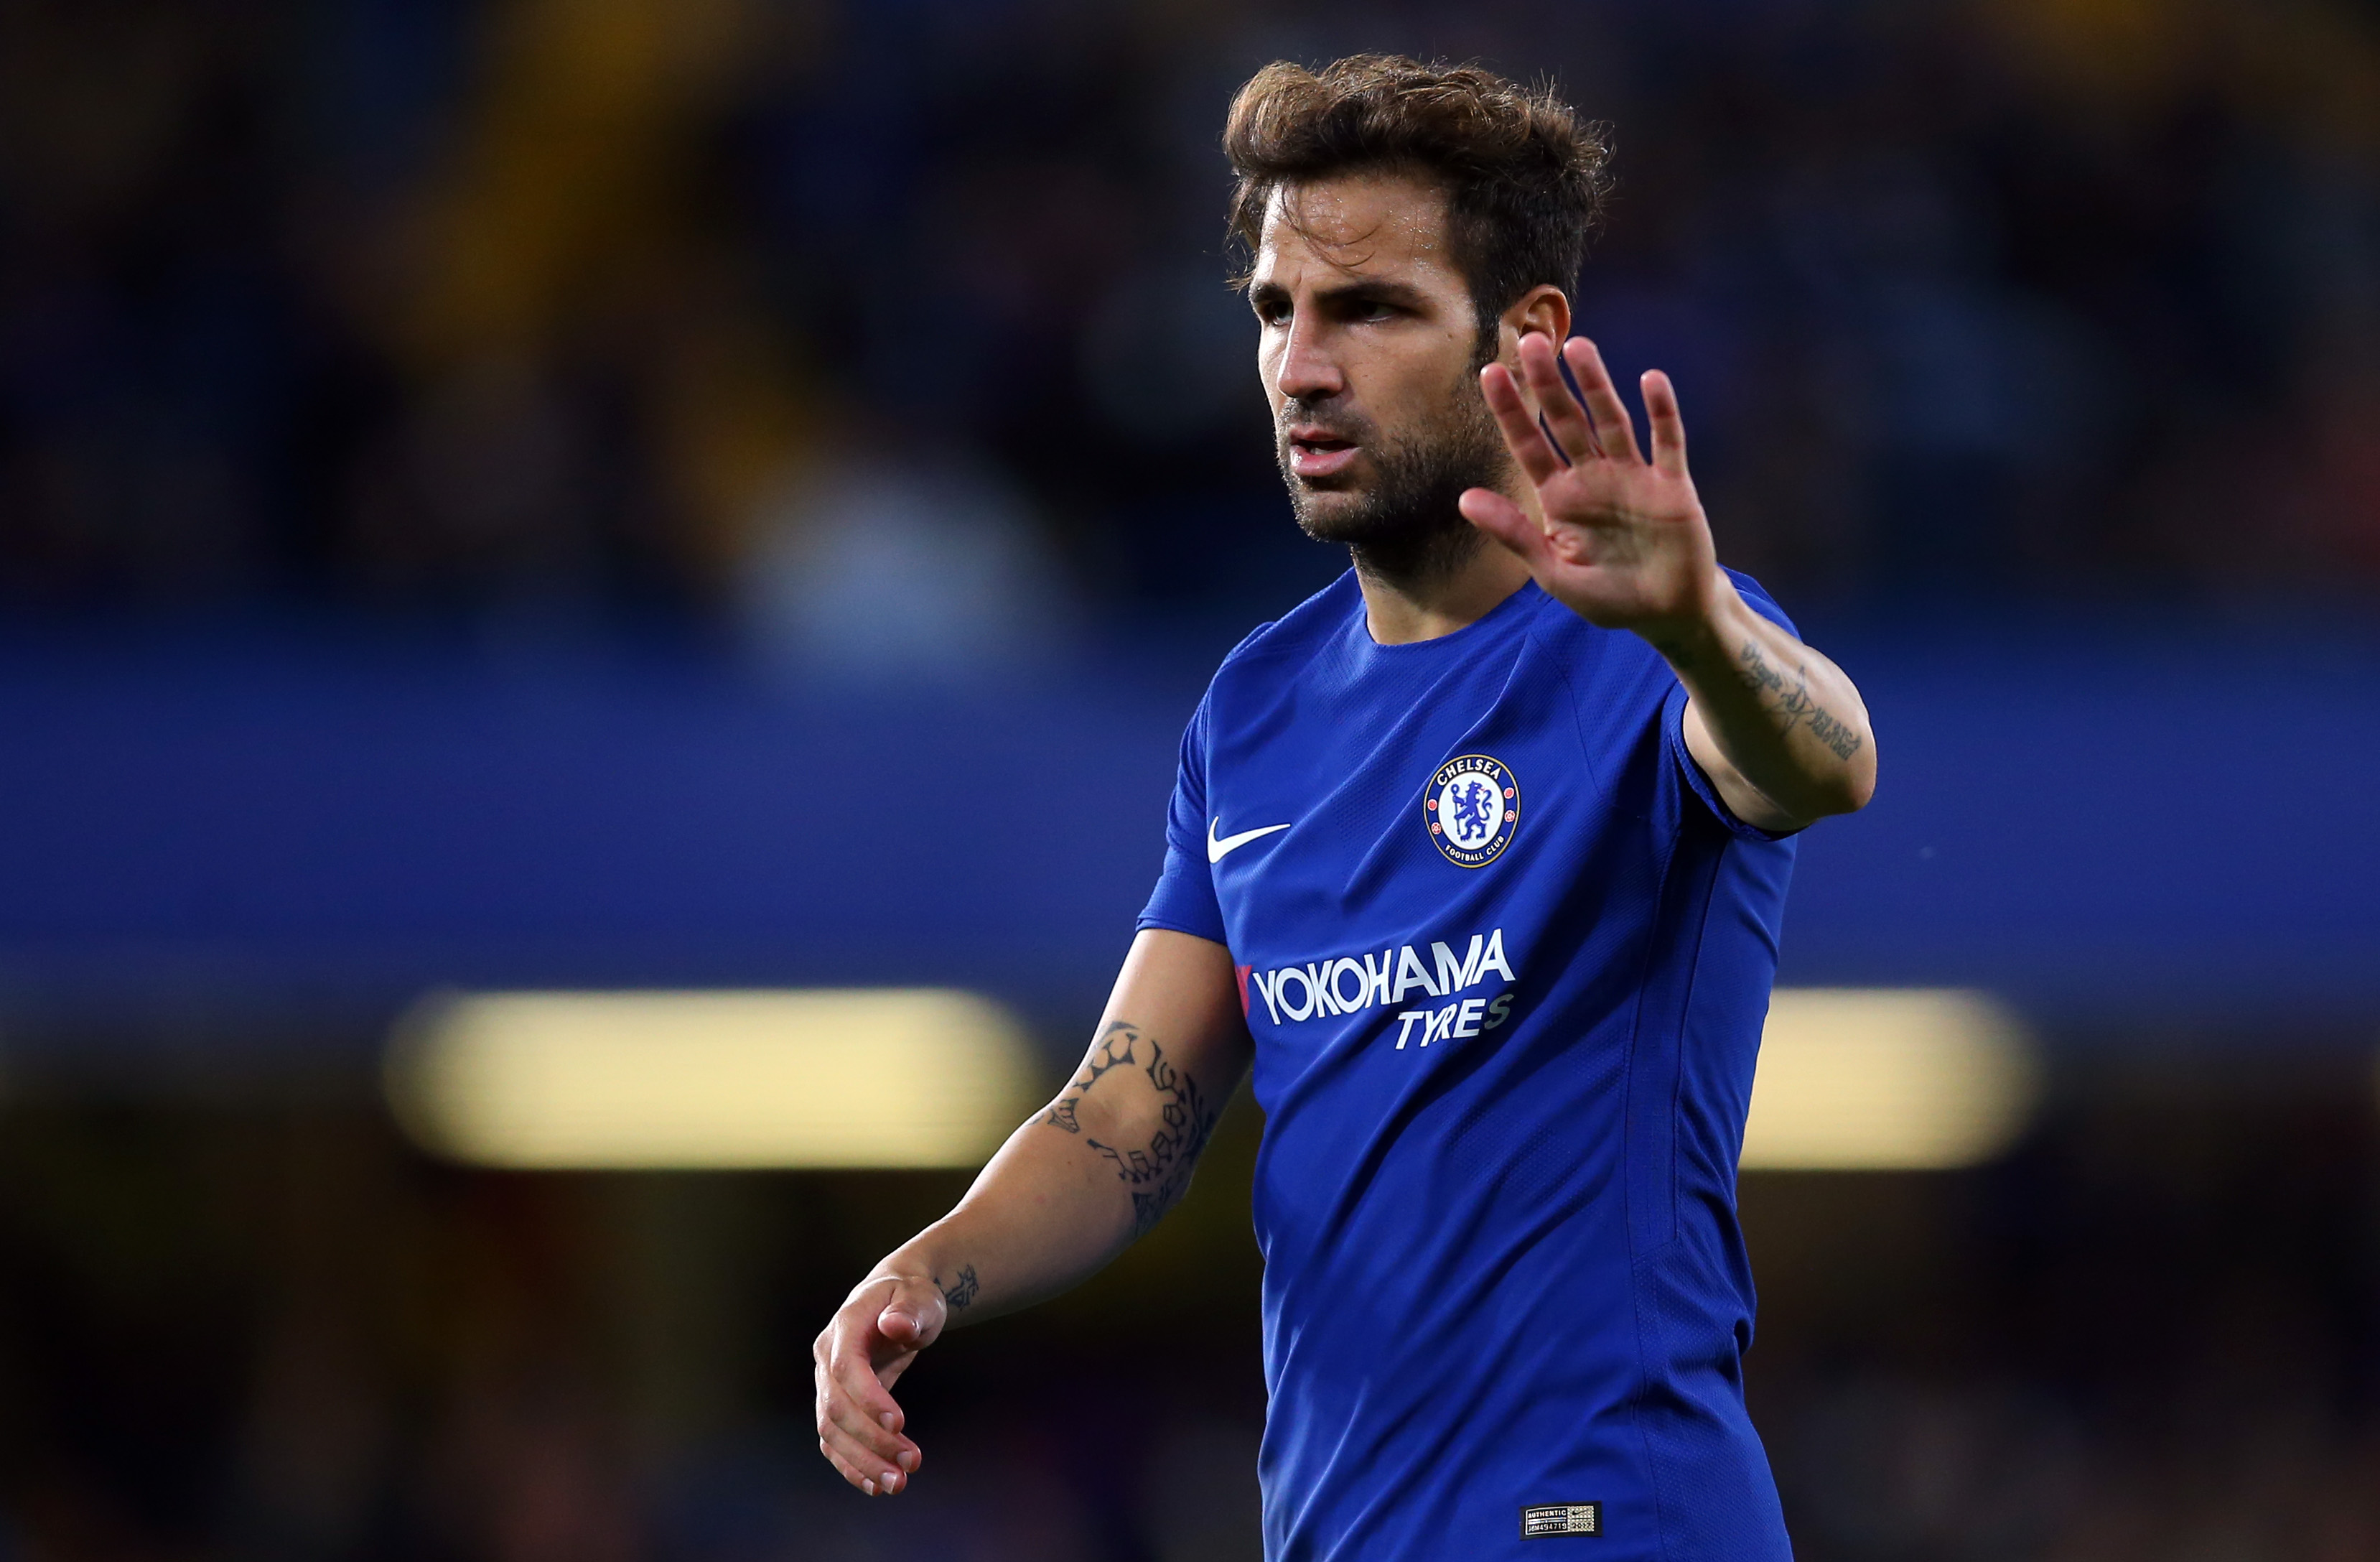 Chelsea's Cesc Fabregas hails Diego Costa as best-ever strike partner